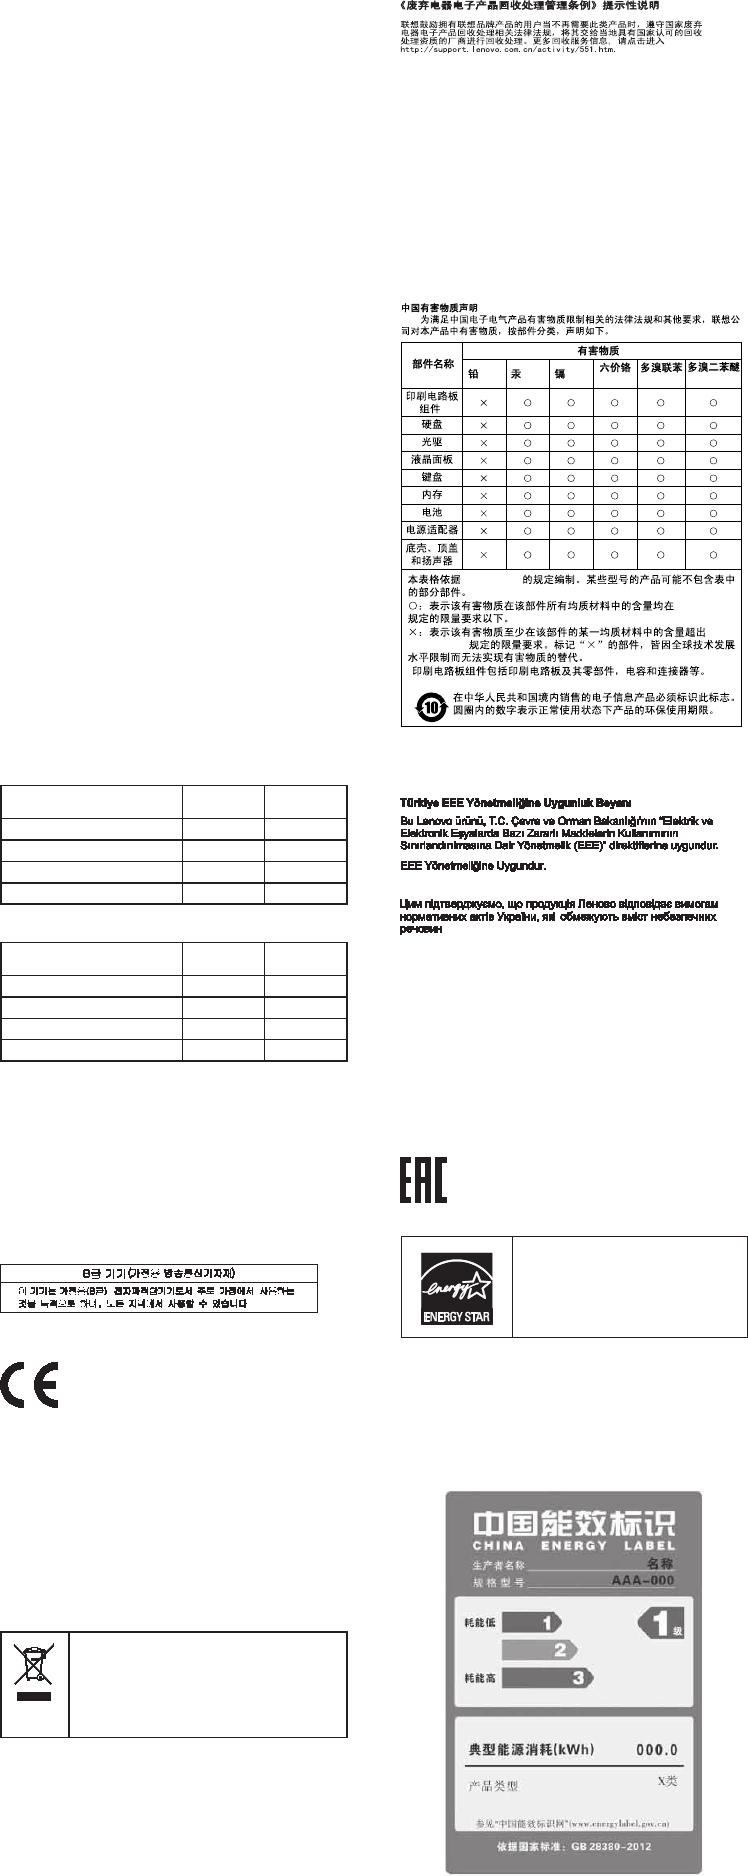 Lenovo E50 70 80 Swsg Jp User Manual 安全上の注 意と保証およびセットアップに